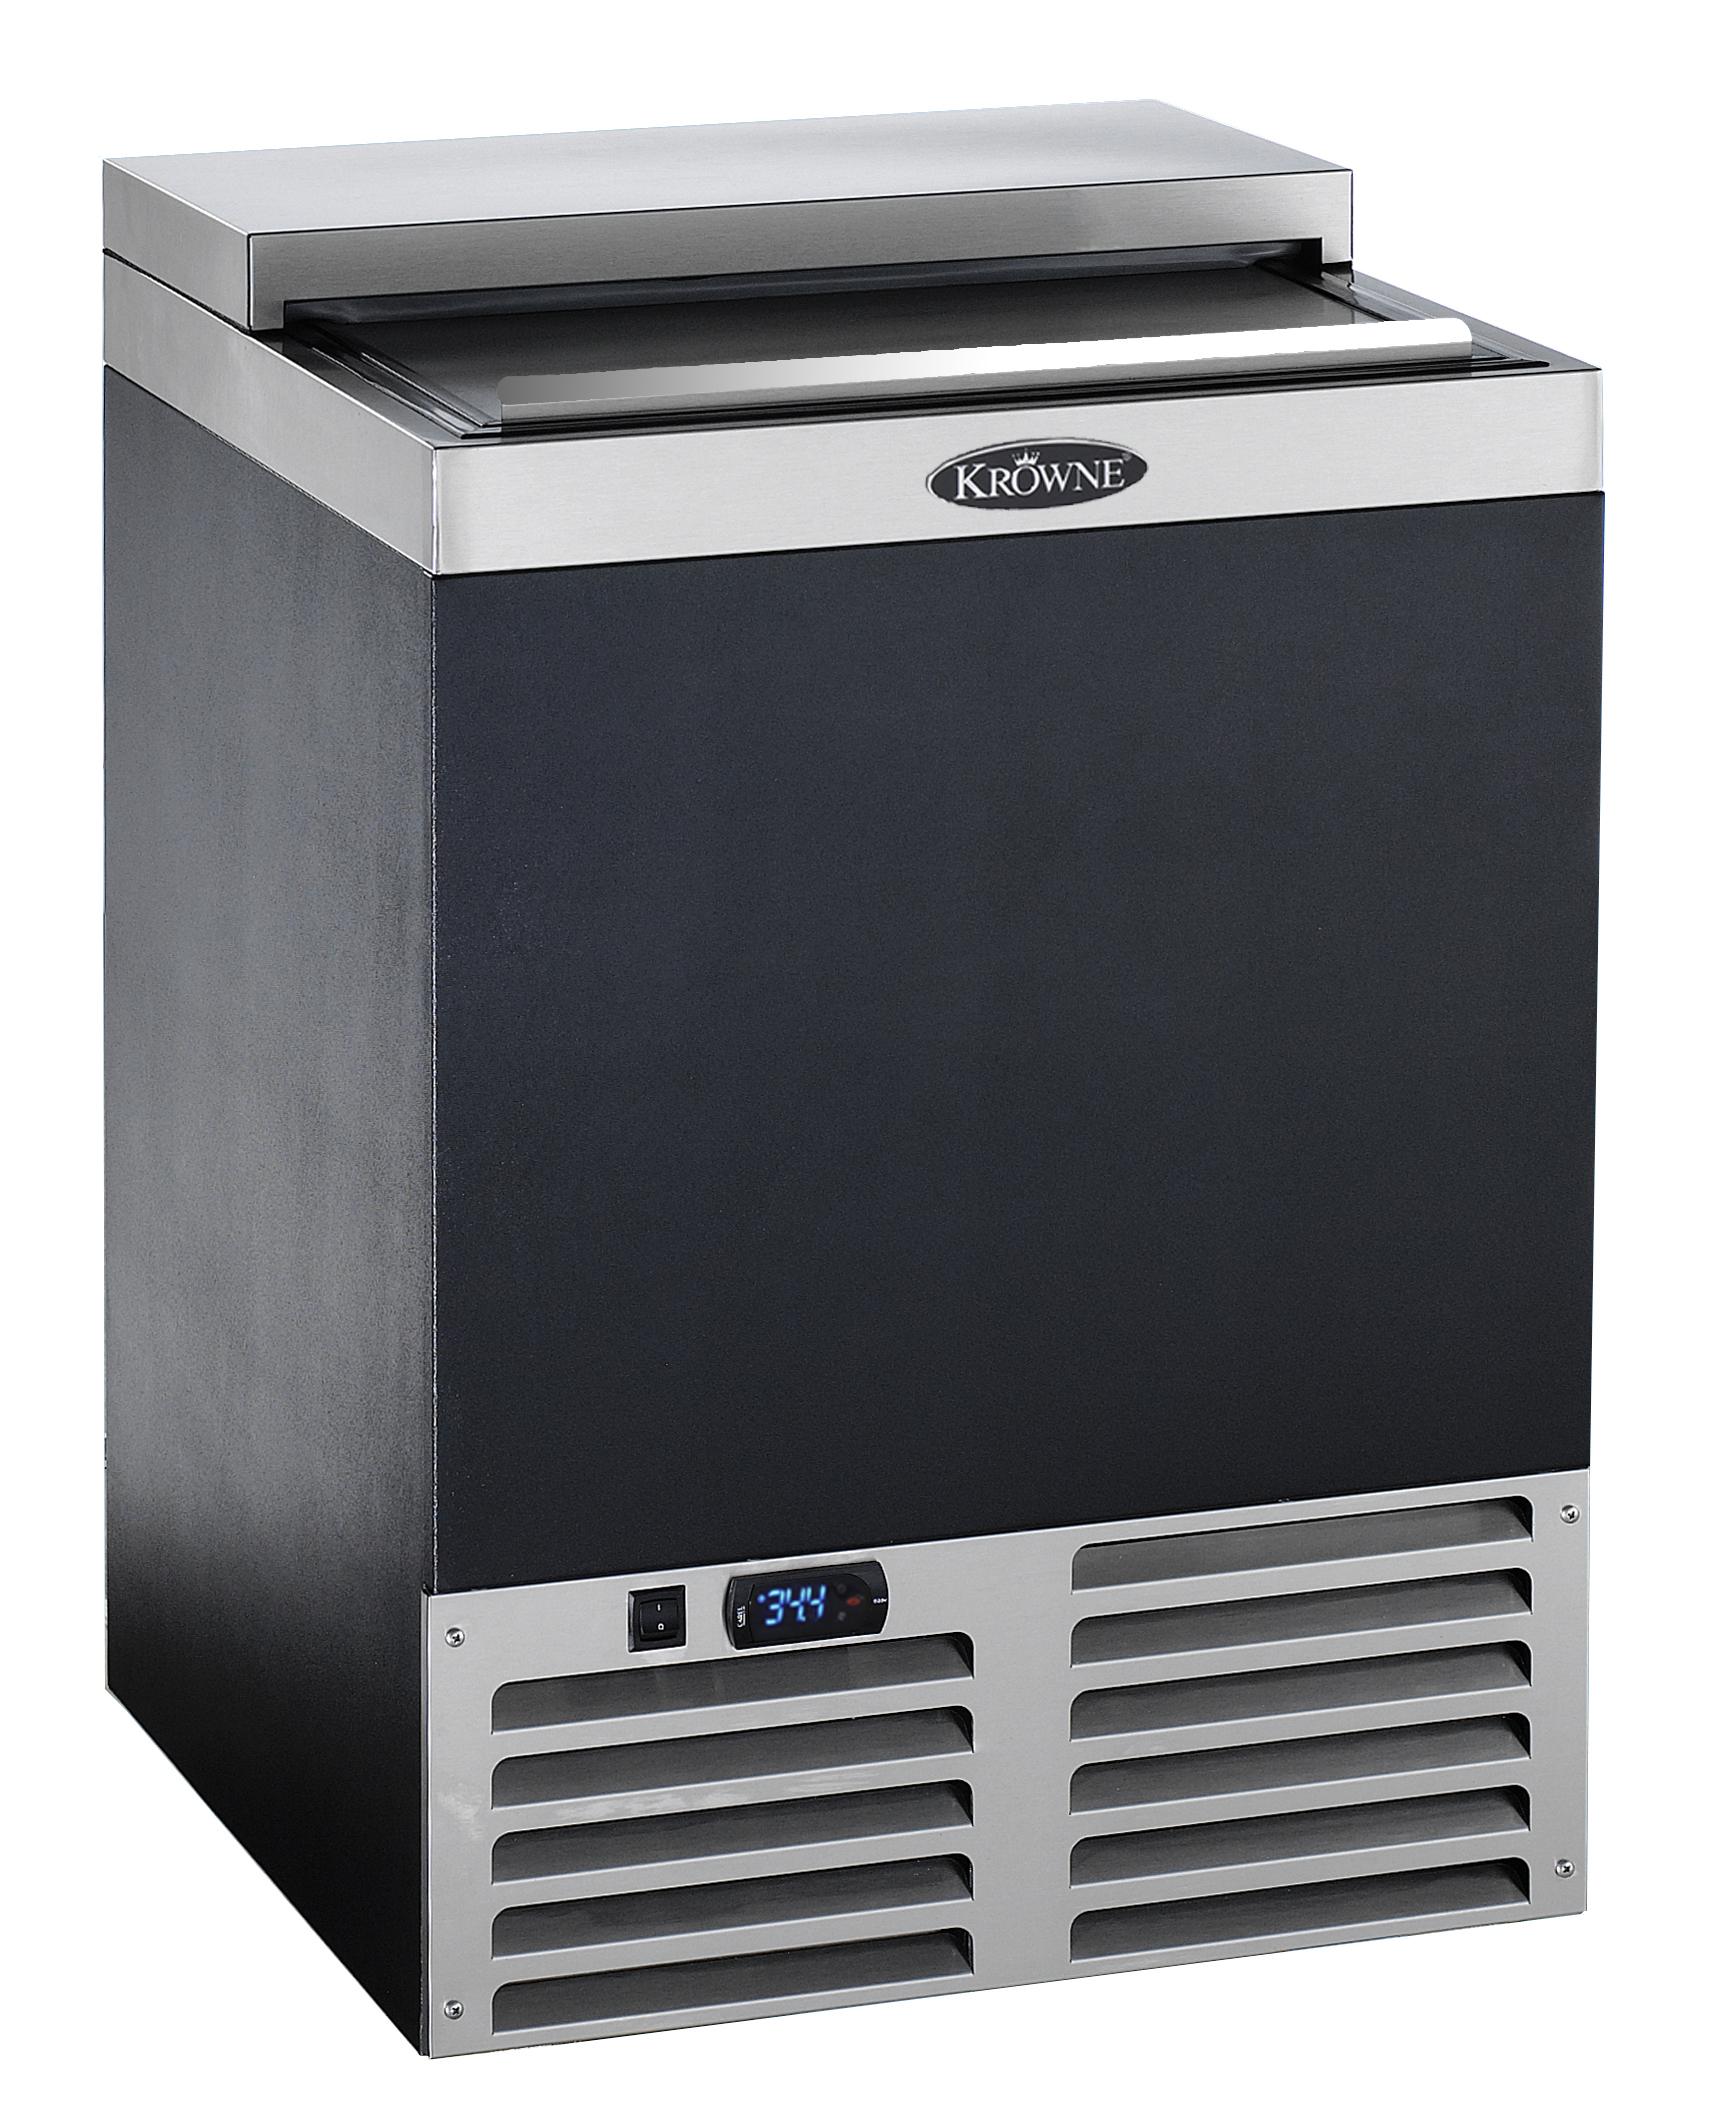 Krowne Metal MC24B refrigeration